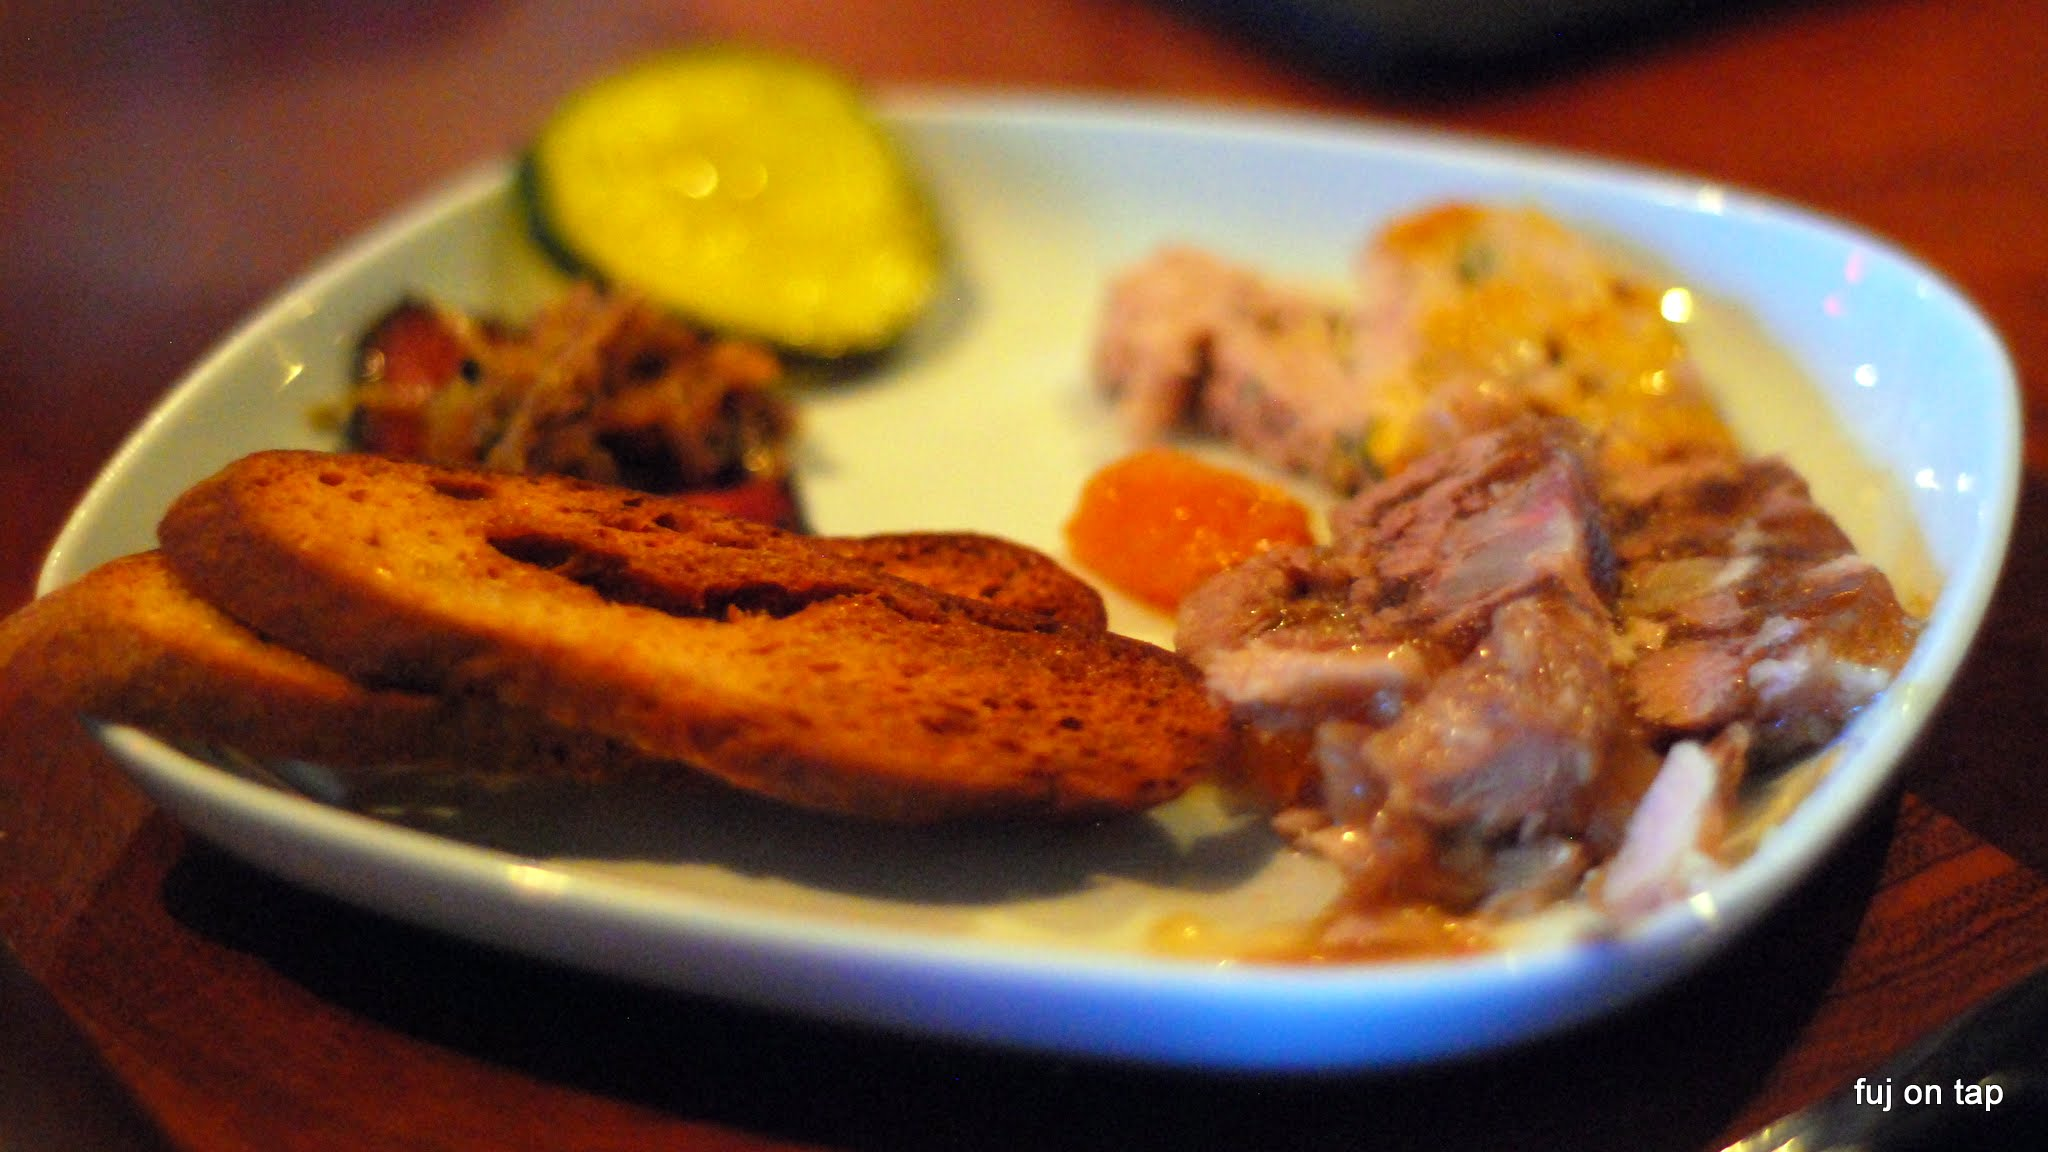 Smoked Beef Tongue, Rabbit Terrine, Chicken Liver Pâté, Pork Head Cheese